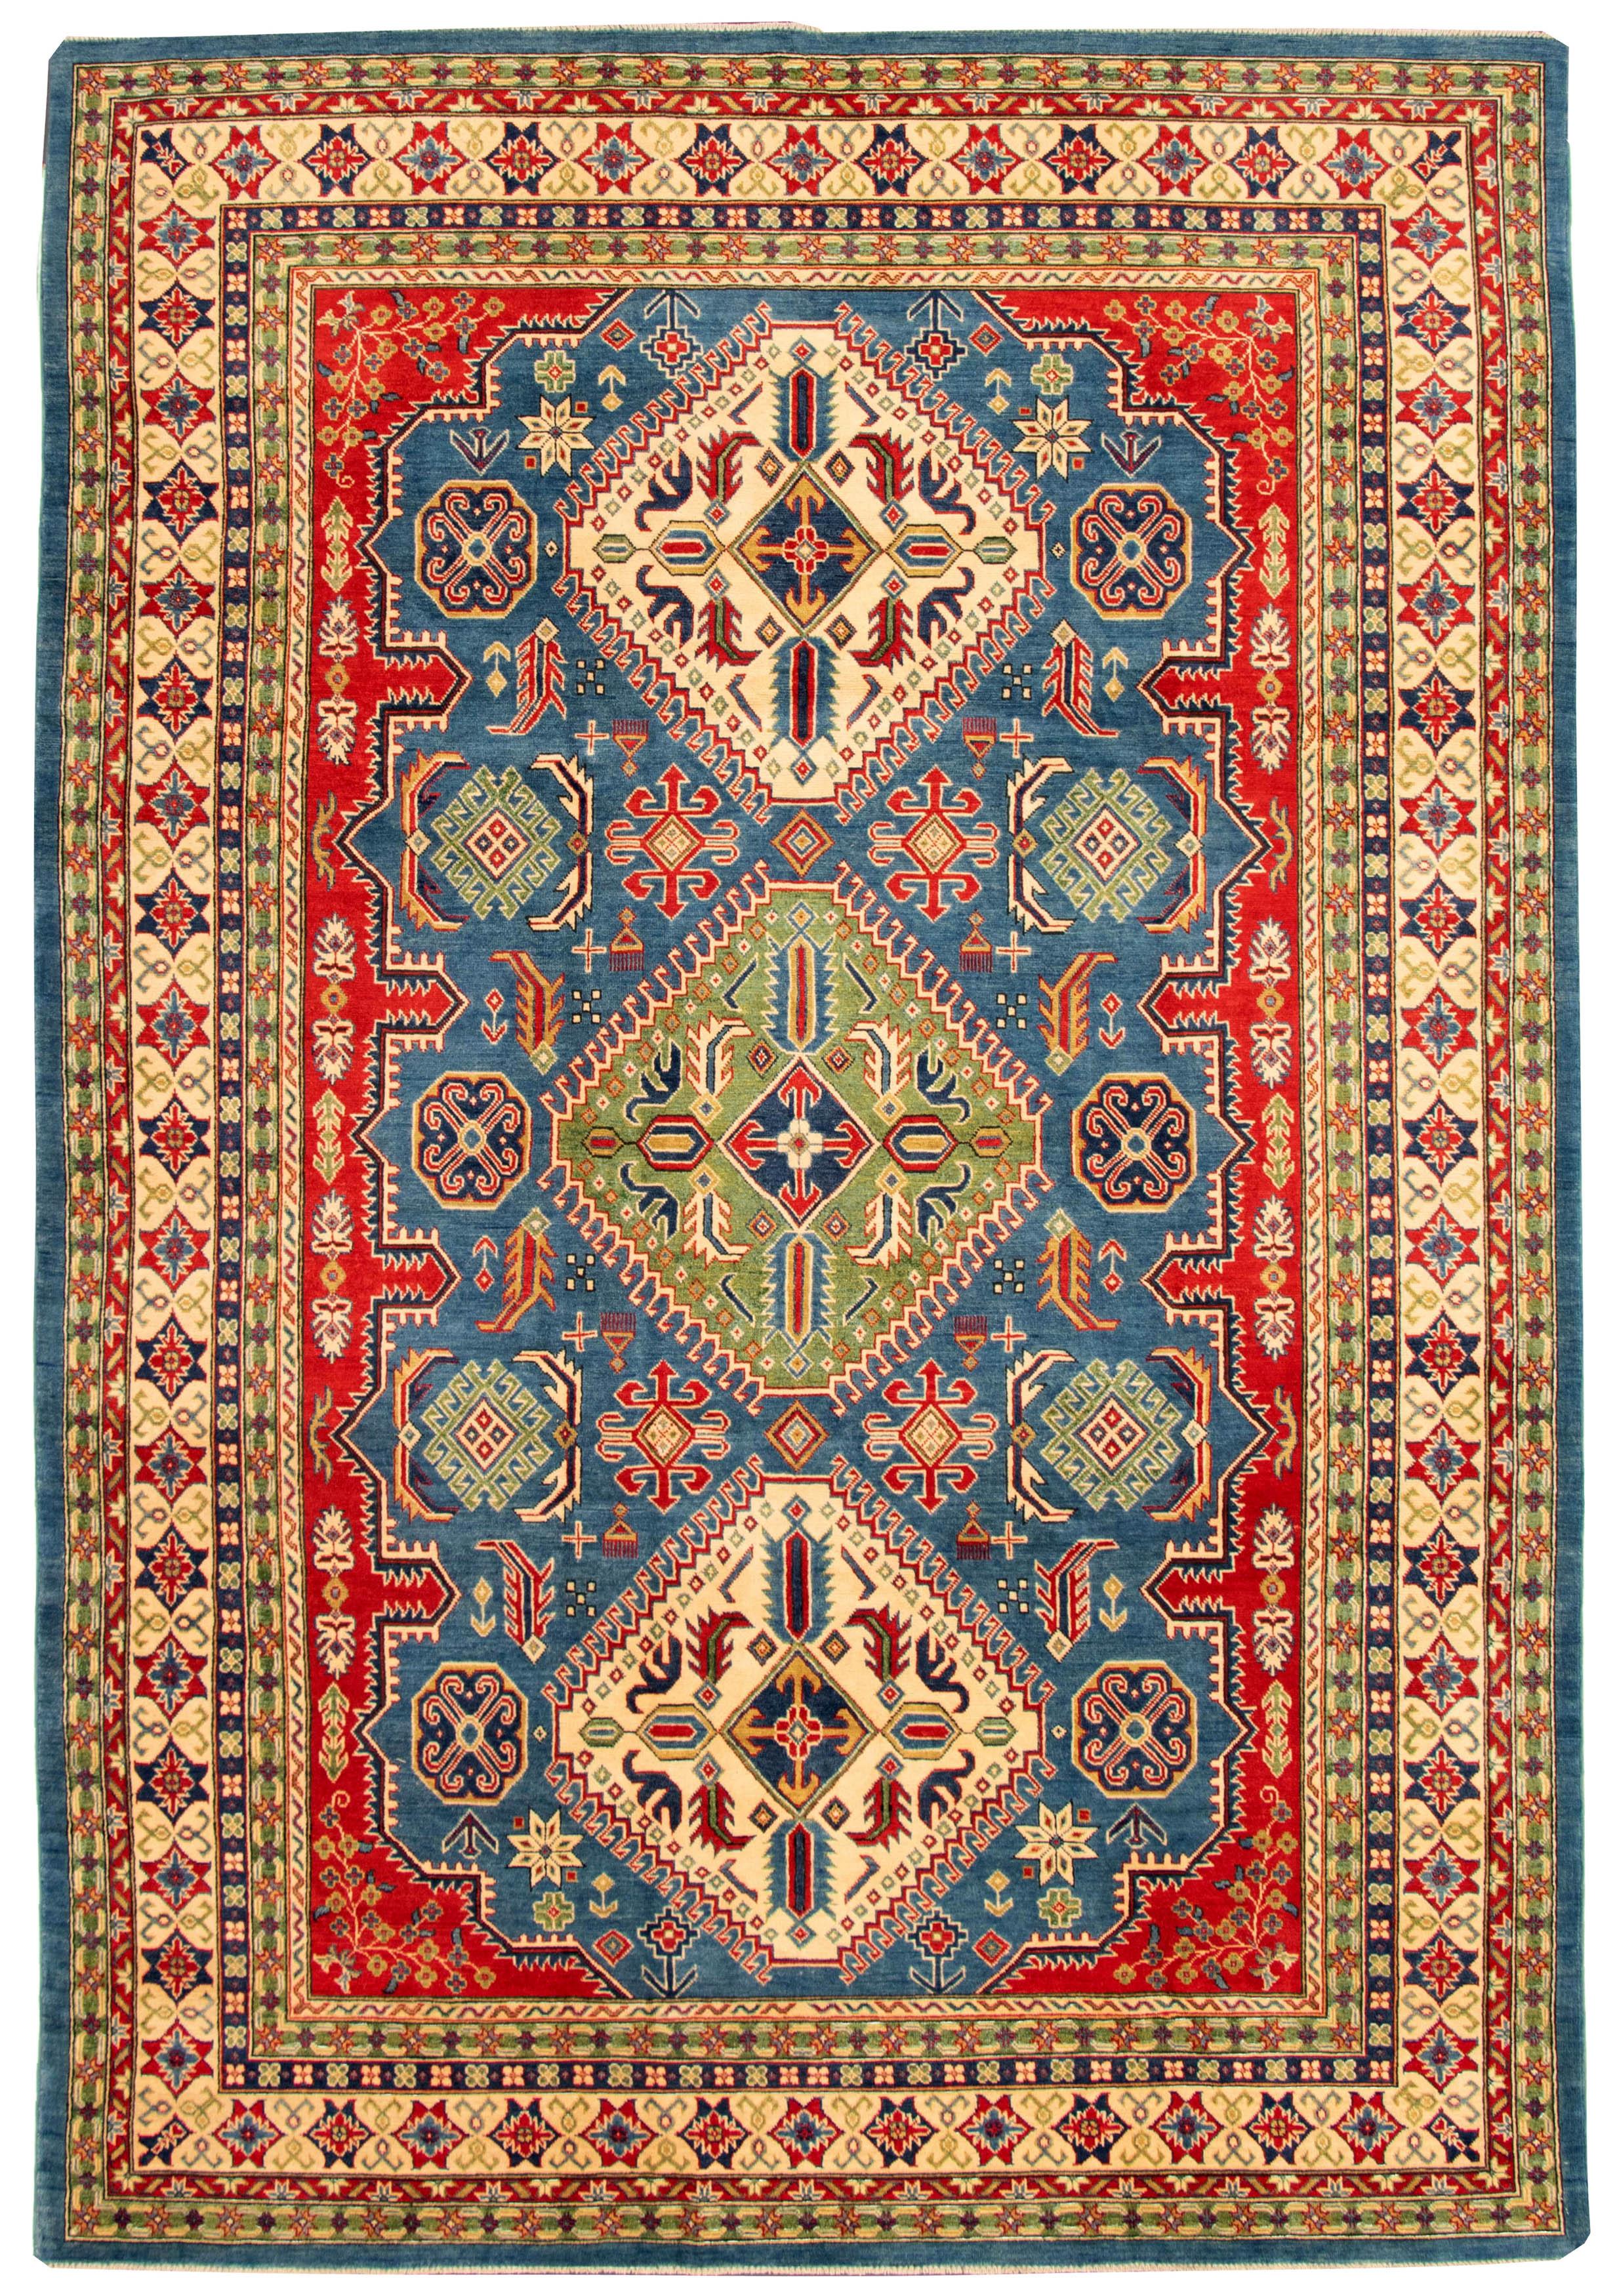 "Hand-knotted Finest Gazni Dark Blue Wool Rug 8'8"" x 12'9"" Size: 8'8"" x 12'9"""